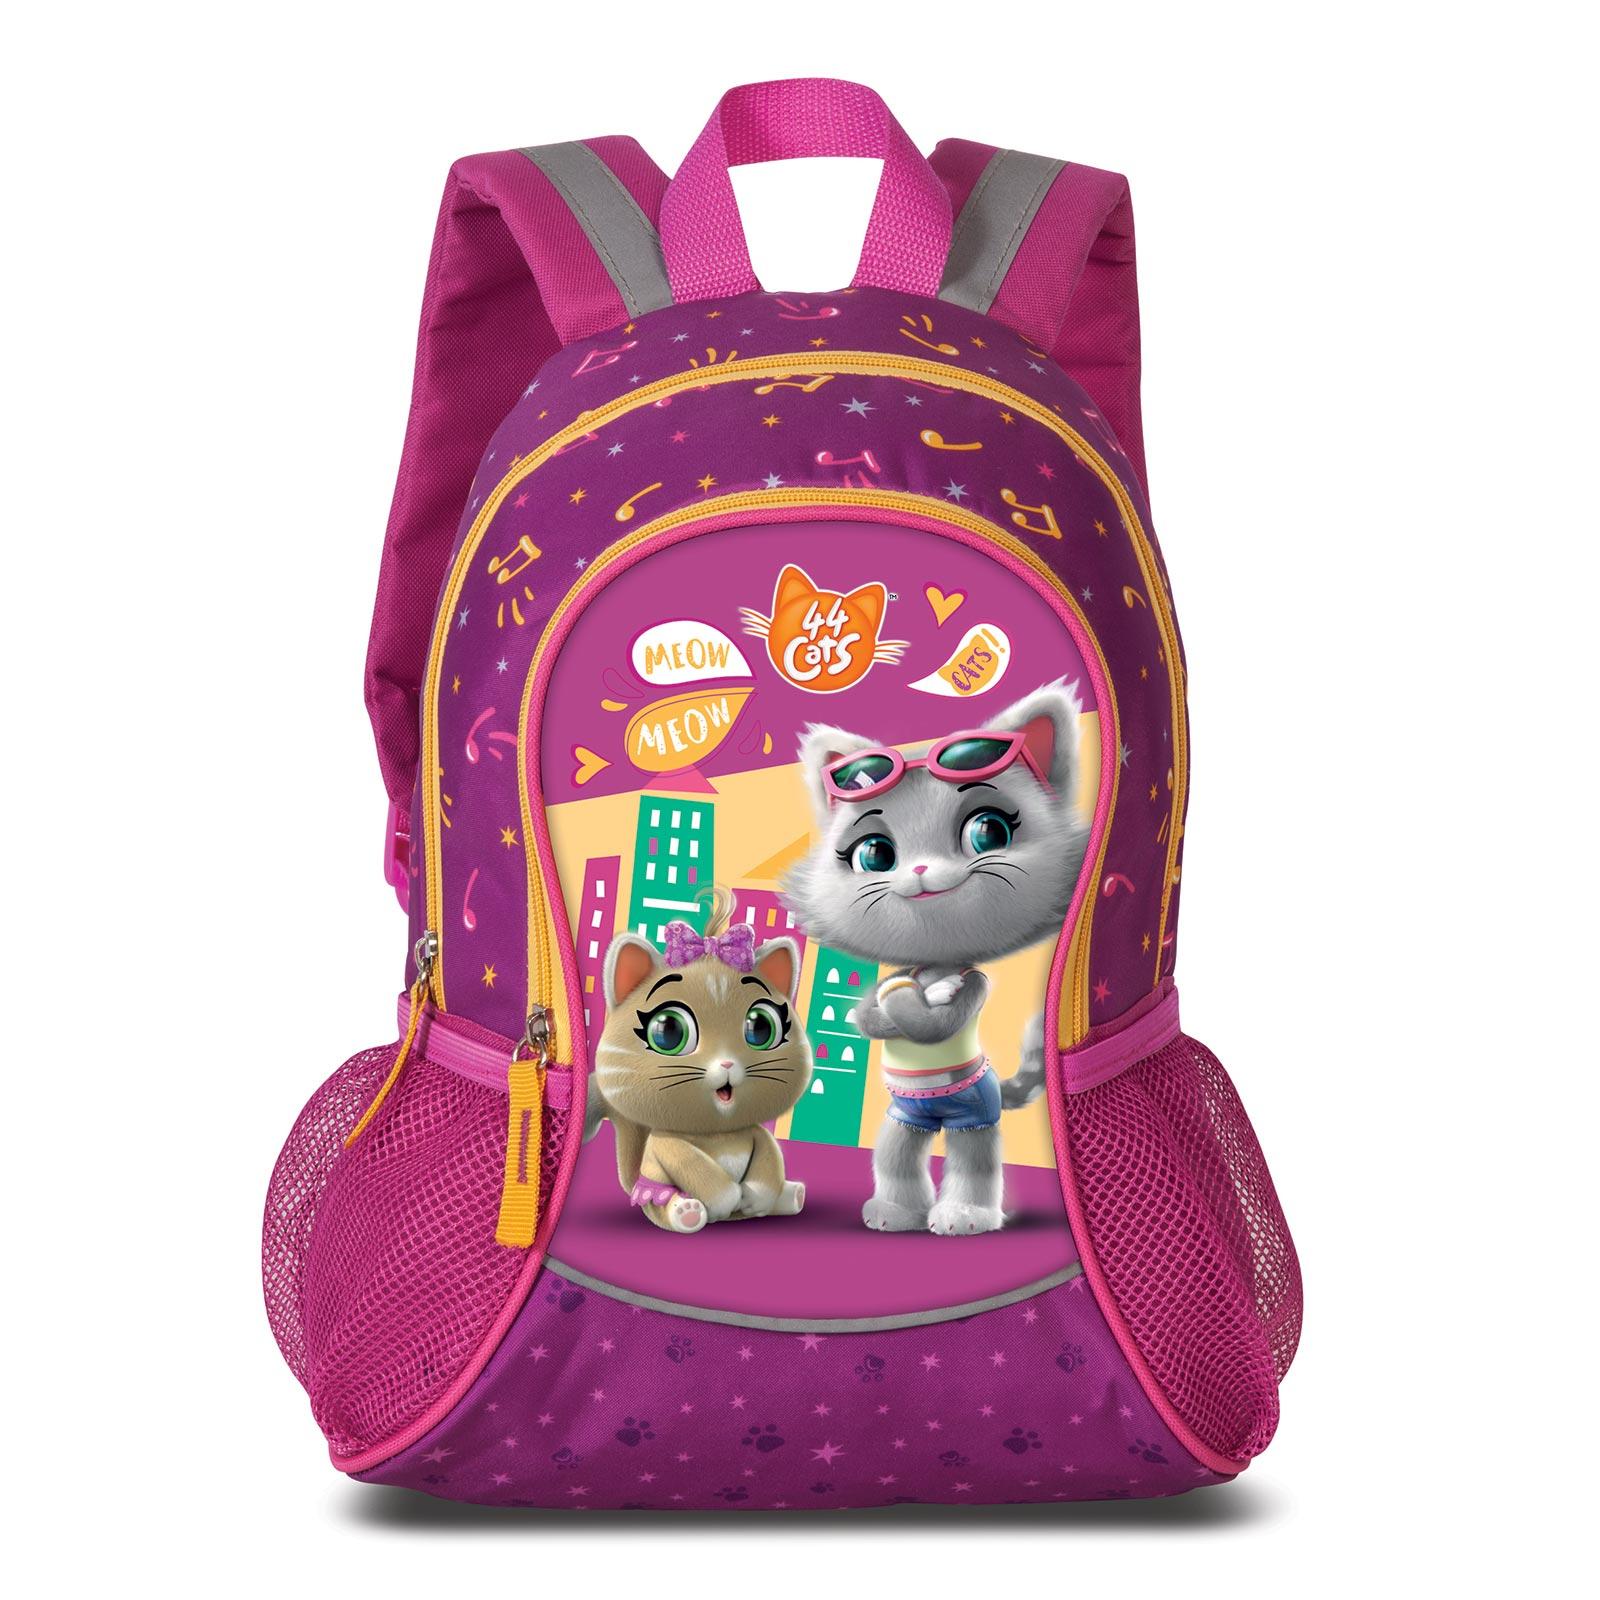 Fabrizio Kids 44 Cats Rucksack 35 cm - Pink 20624-3100